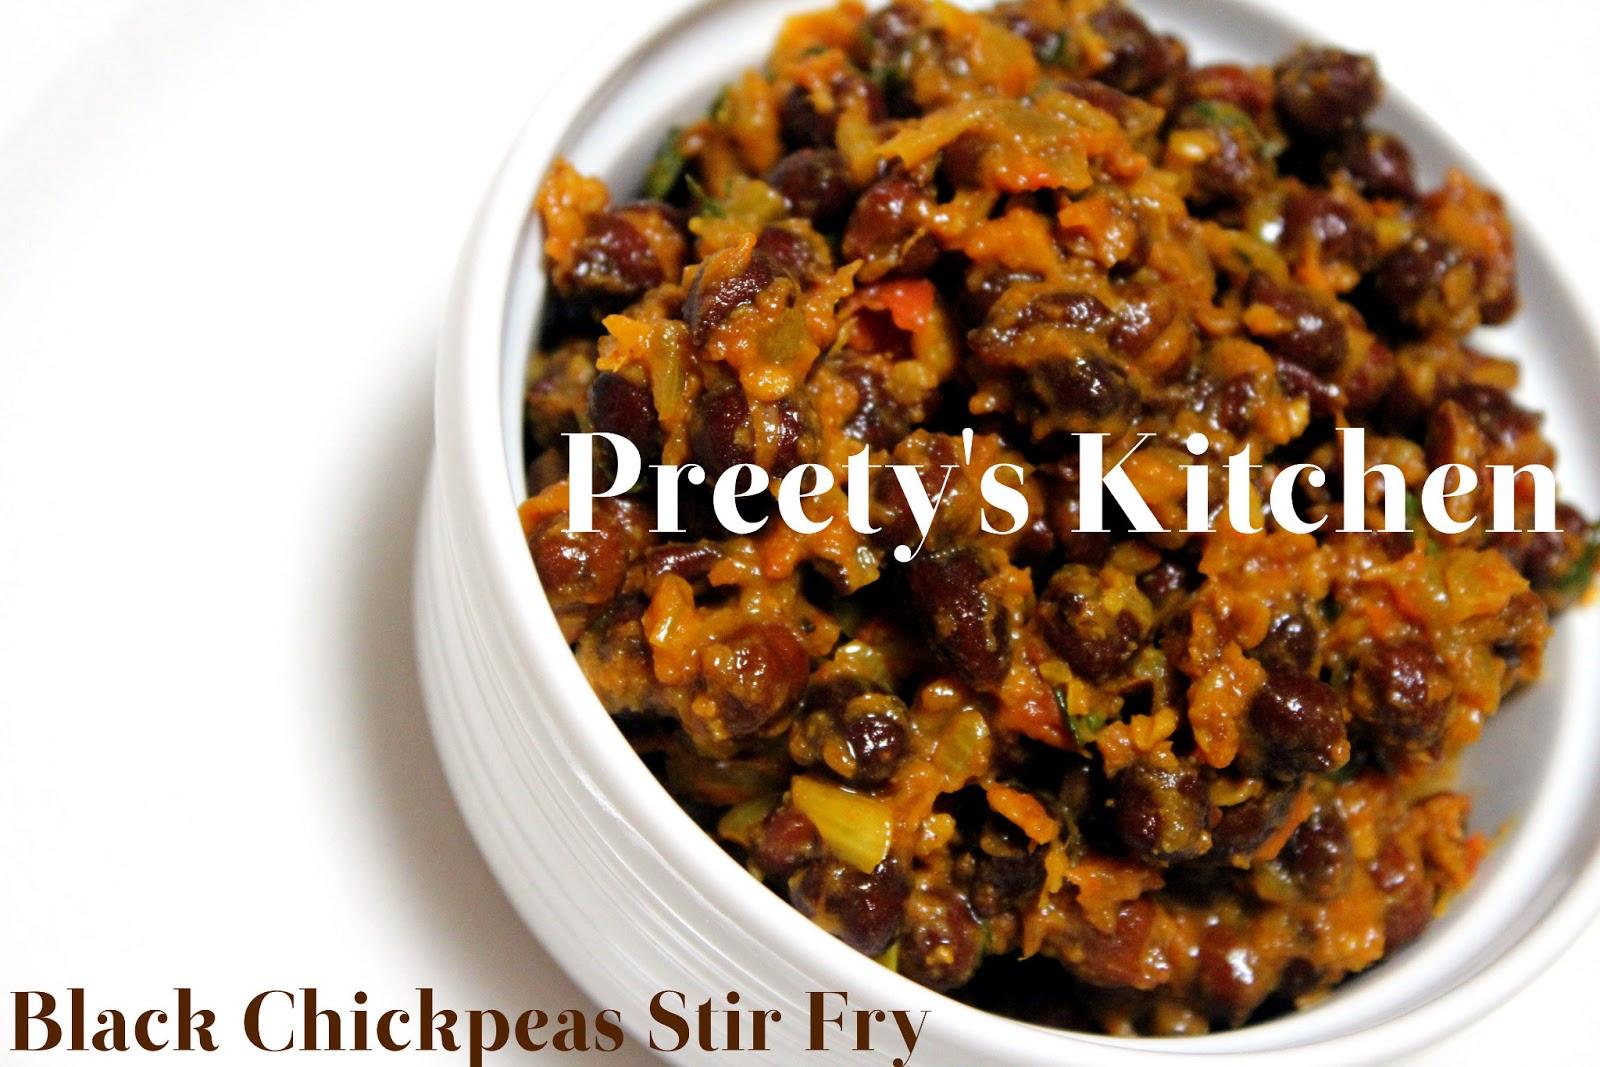 Preety's Kitchen: Kala Chana Masala/ Black Chickpeas Stir Fry